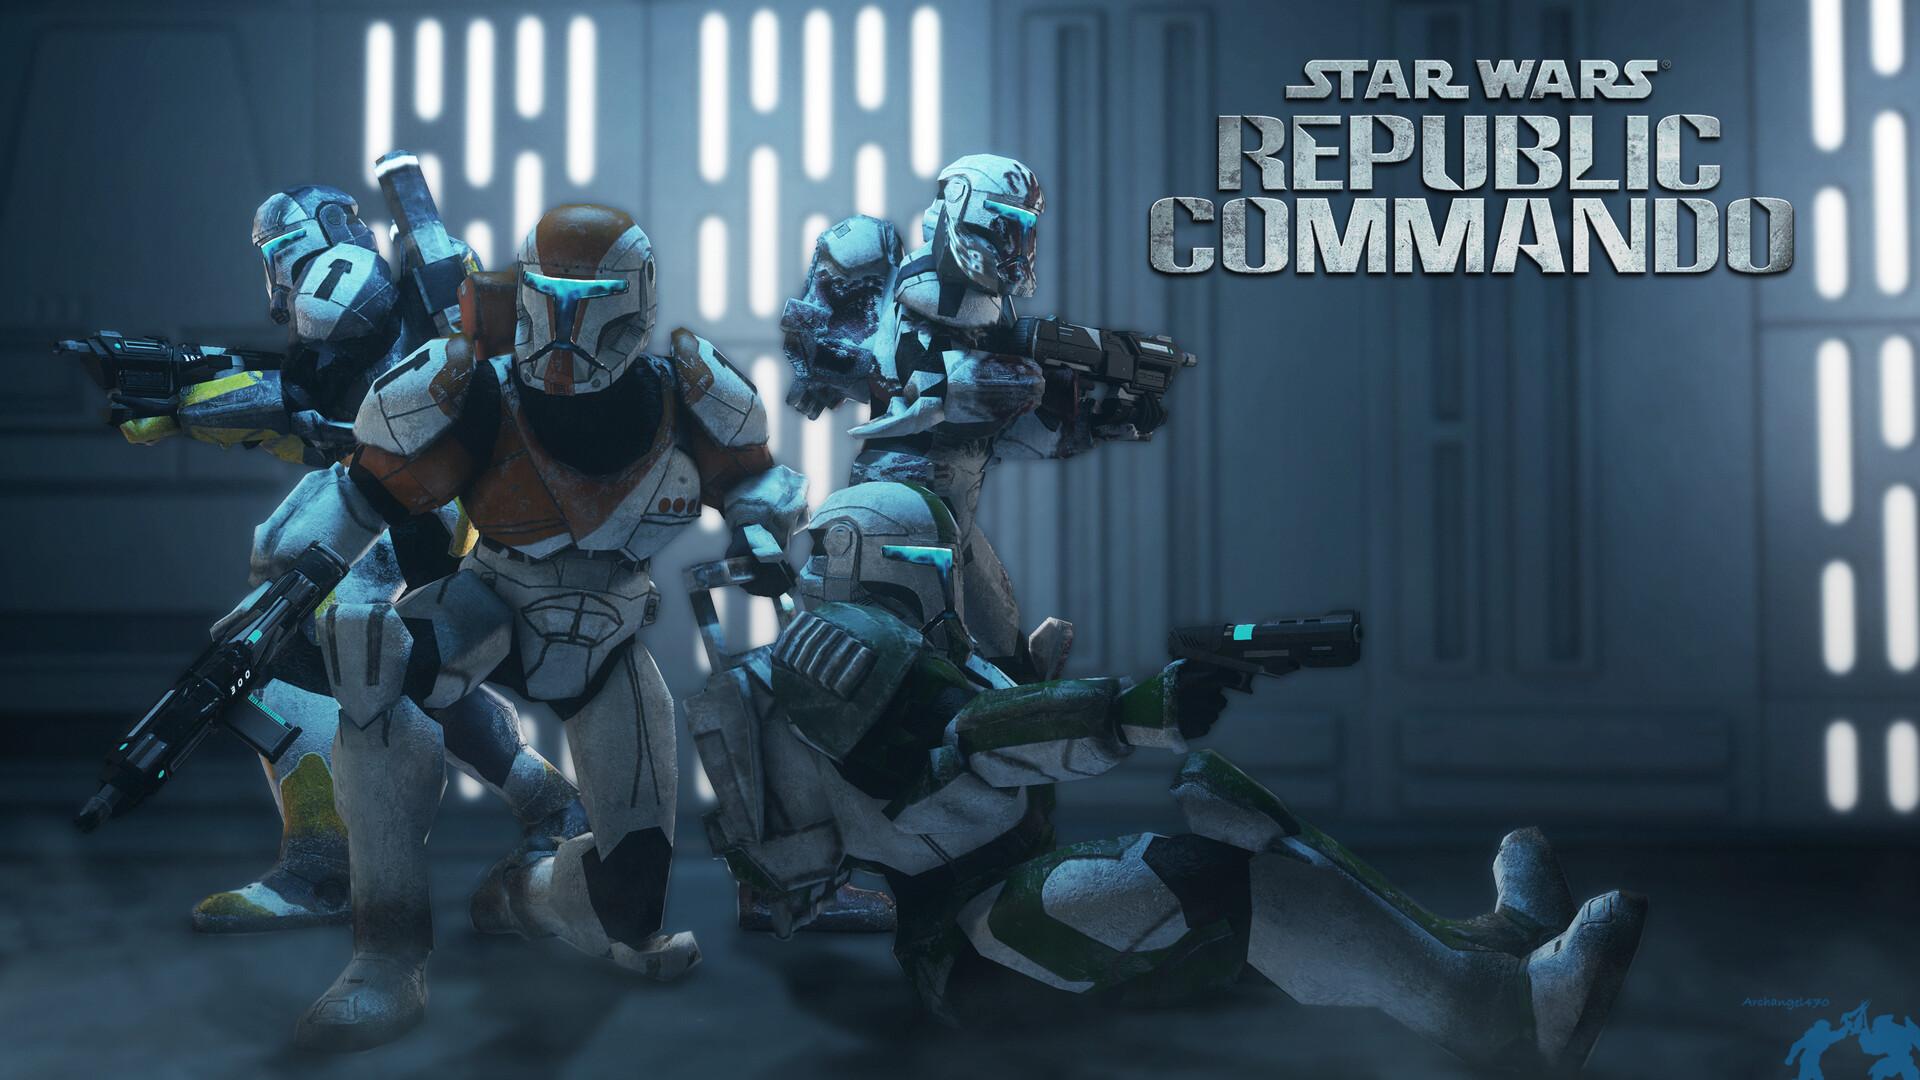 Artstation Star Wars Republic Commando 4k Wallpaper Ben Walker